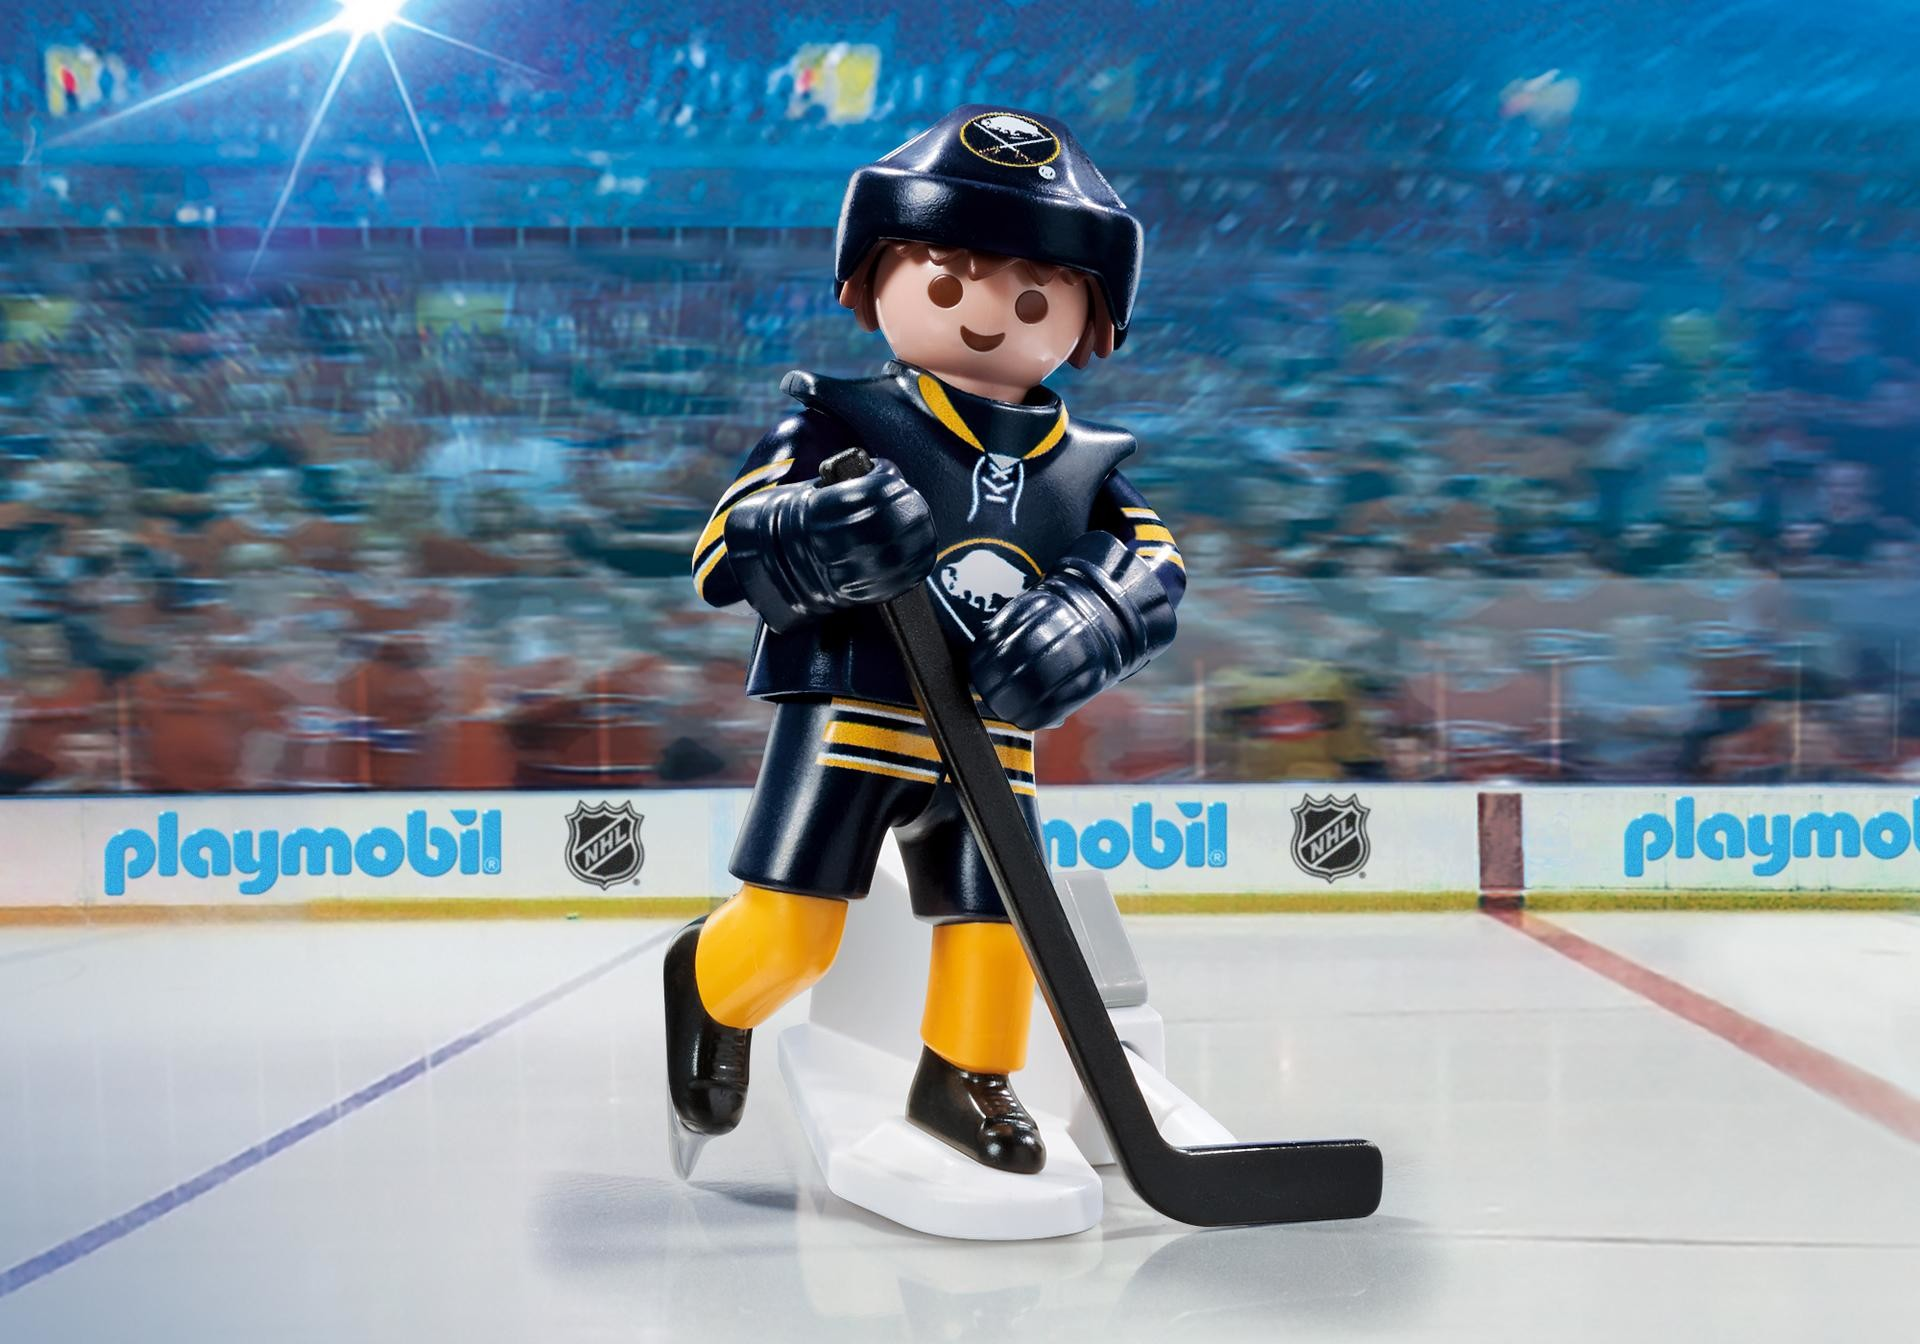 NHL® Buffalo Sabres® Player